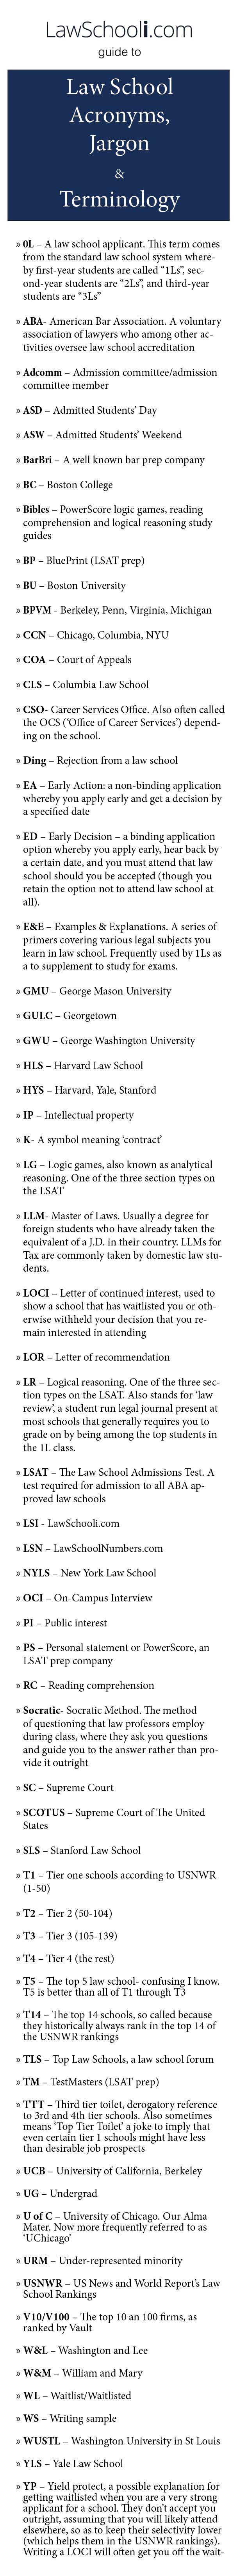 FUTURE LAW SCHOOL STUDENT.... needs help!?